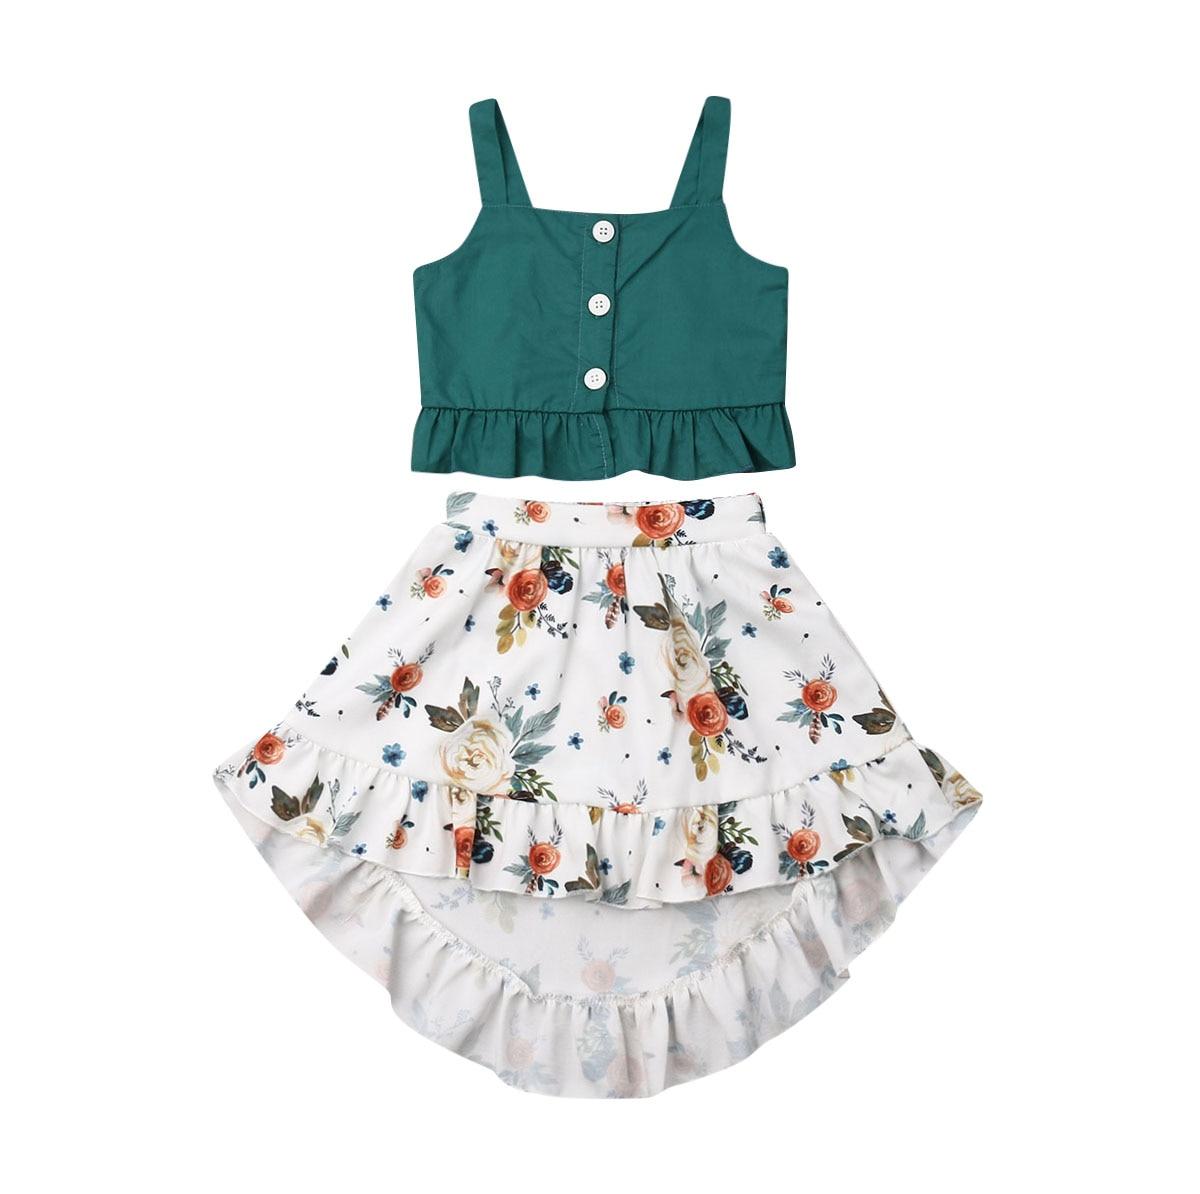 0dfb78e334b5 Summer Toddler Kids Baby Girl Sleeveless Tank Tops Floral Boho Skirt 2PCS  Outfits Princess Girls Holiday